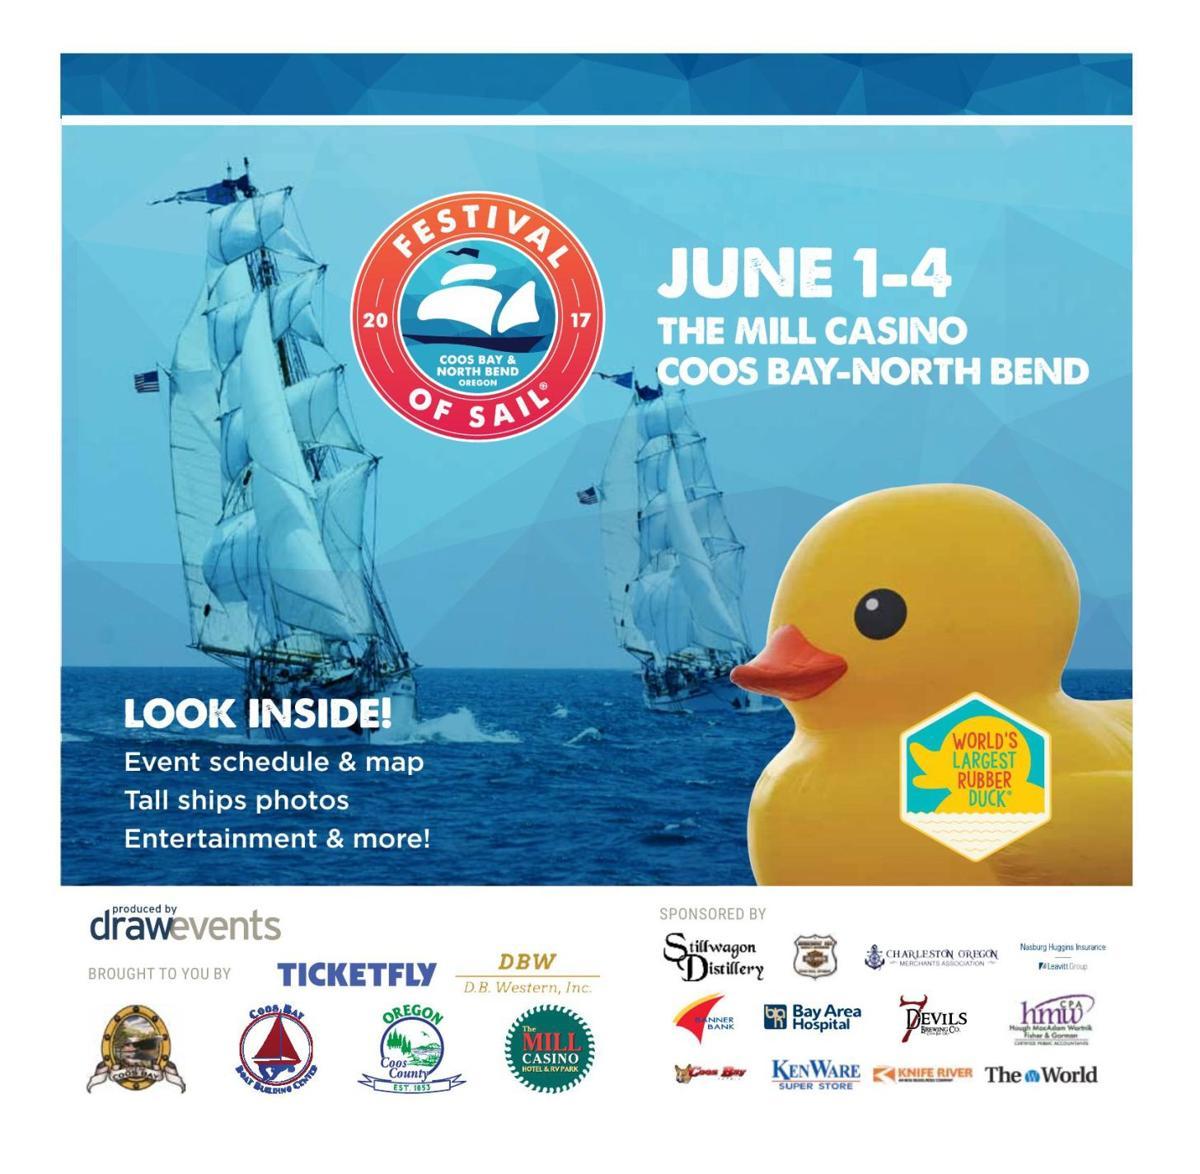 2017 Festival of Sails June 1-4 Coos Bay